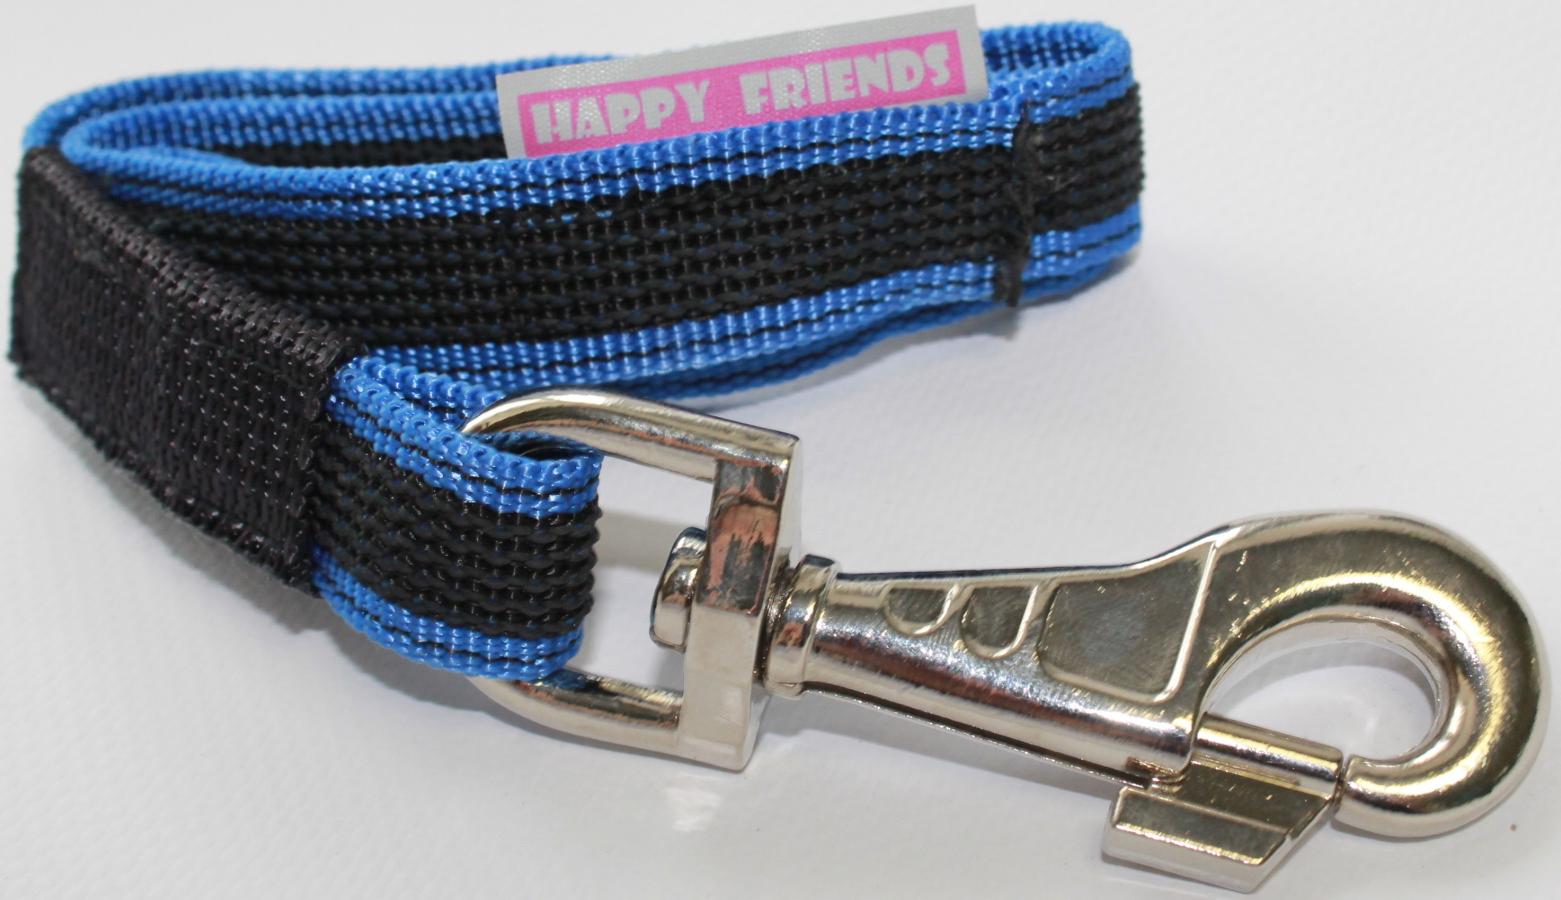 Поводок-водилка Happy Friends, плавающий, нескользящий, цвет: синий, ширина 2,5 см, длина 0,40 м поводок для собак happy friends нескользящий цвет синий ширина 2 см длина 2 м